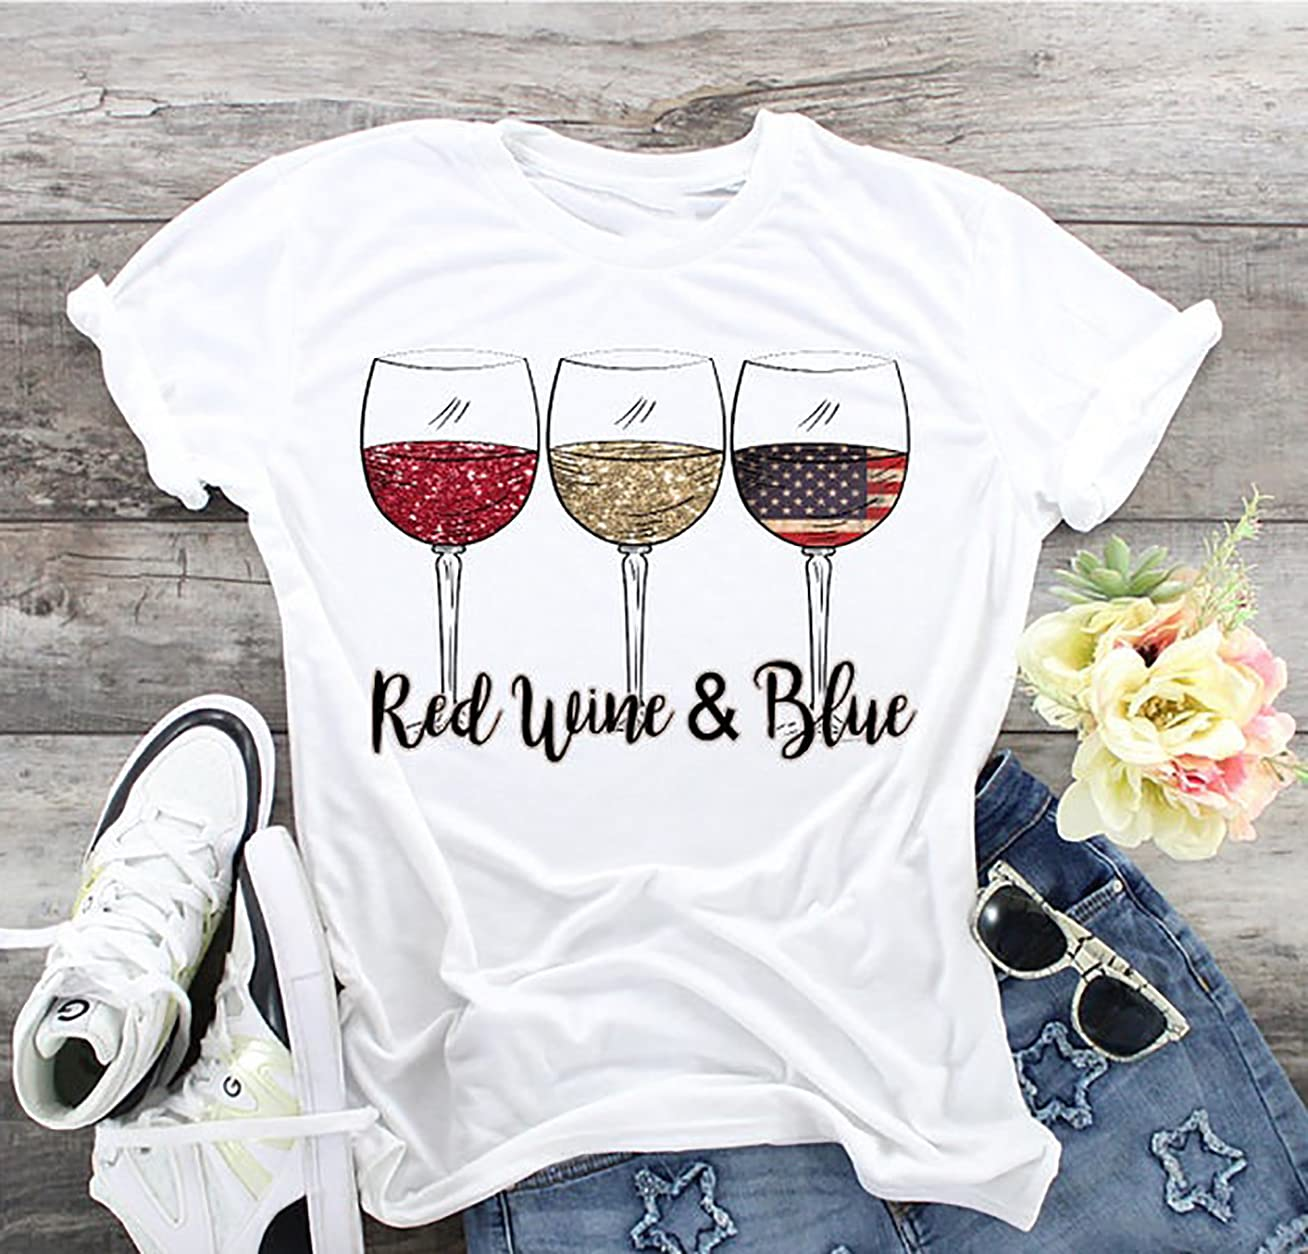 """Red Wine & Blue Shirt, 4Th Of July Wine, Red White Blue Wine Glasses, Flag Wine Glasses, Patriotic Wine, Print Shirt,Unisex Short- Sleeve T-Shirt,Ladies Short-Sleeve Shirt,Sweatshirt,Hoodie"""